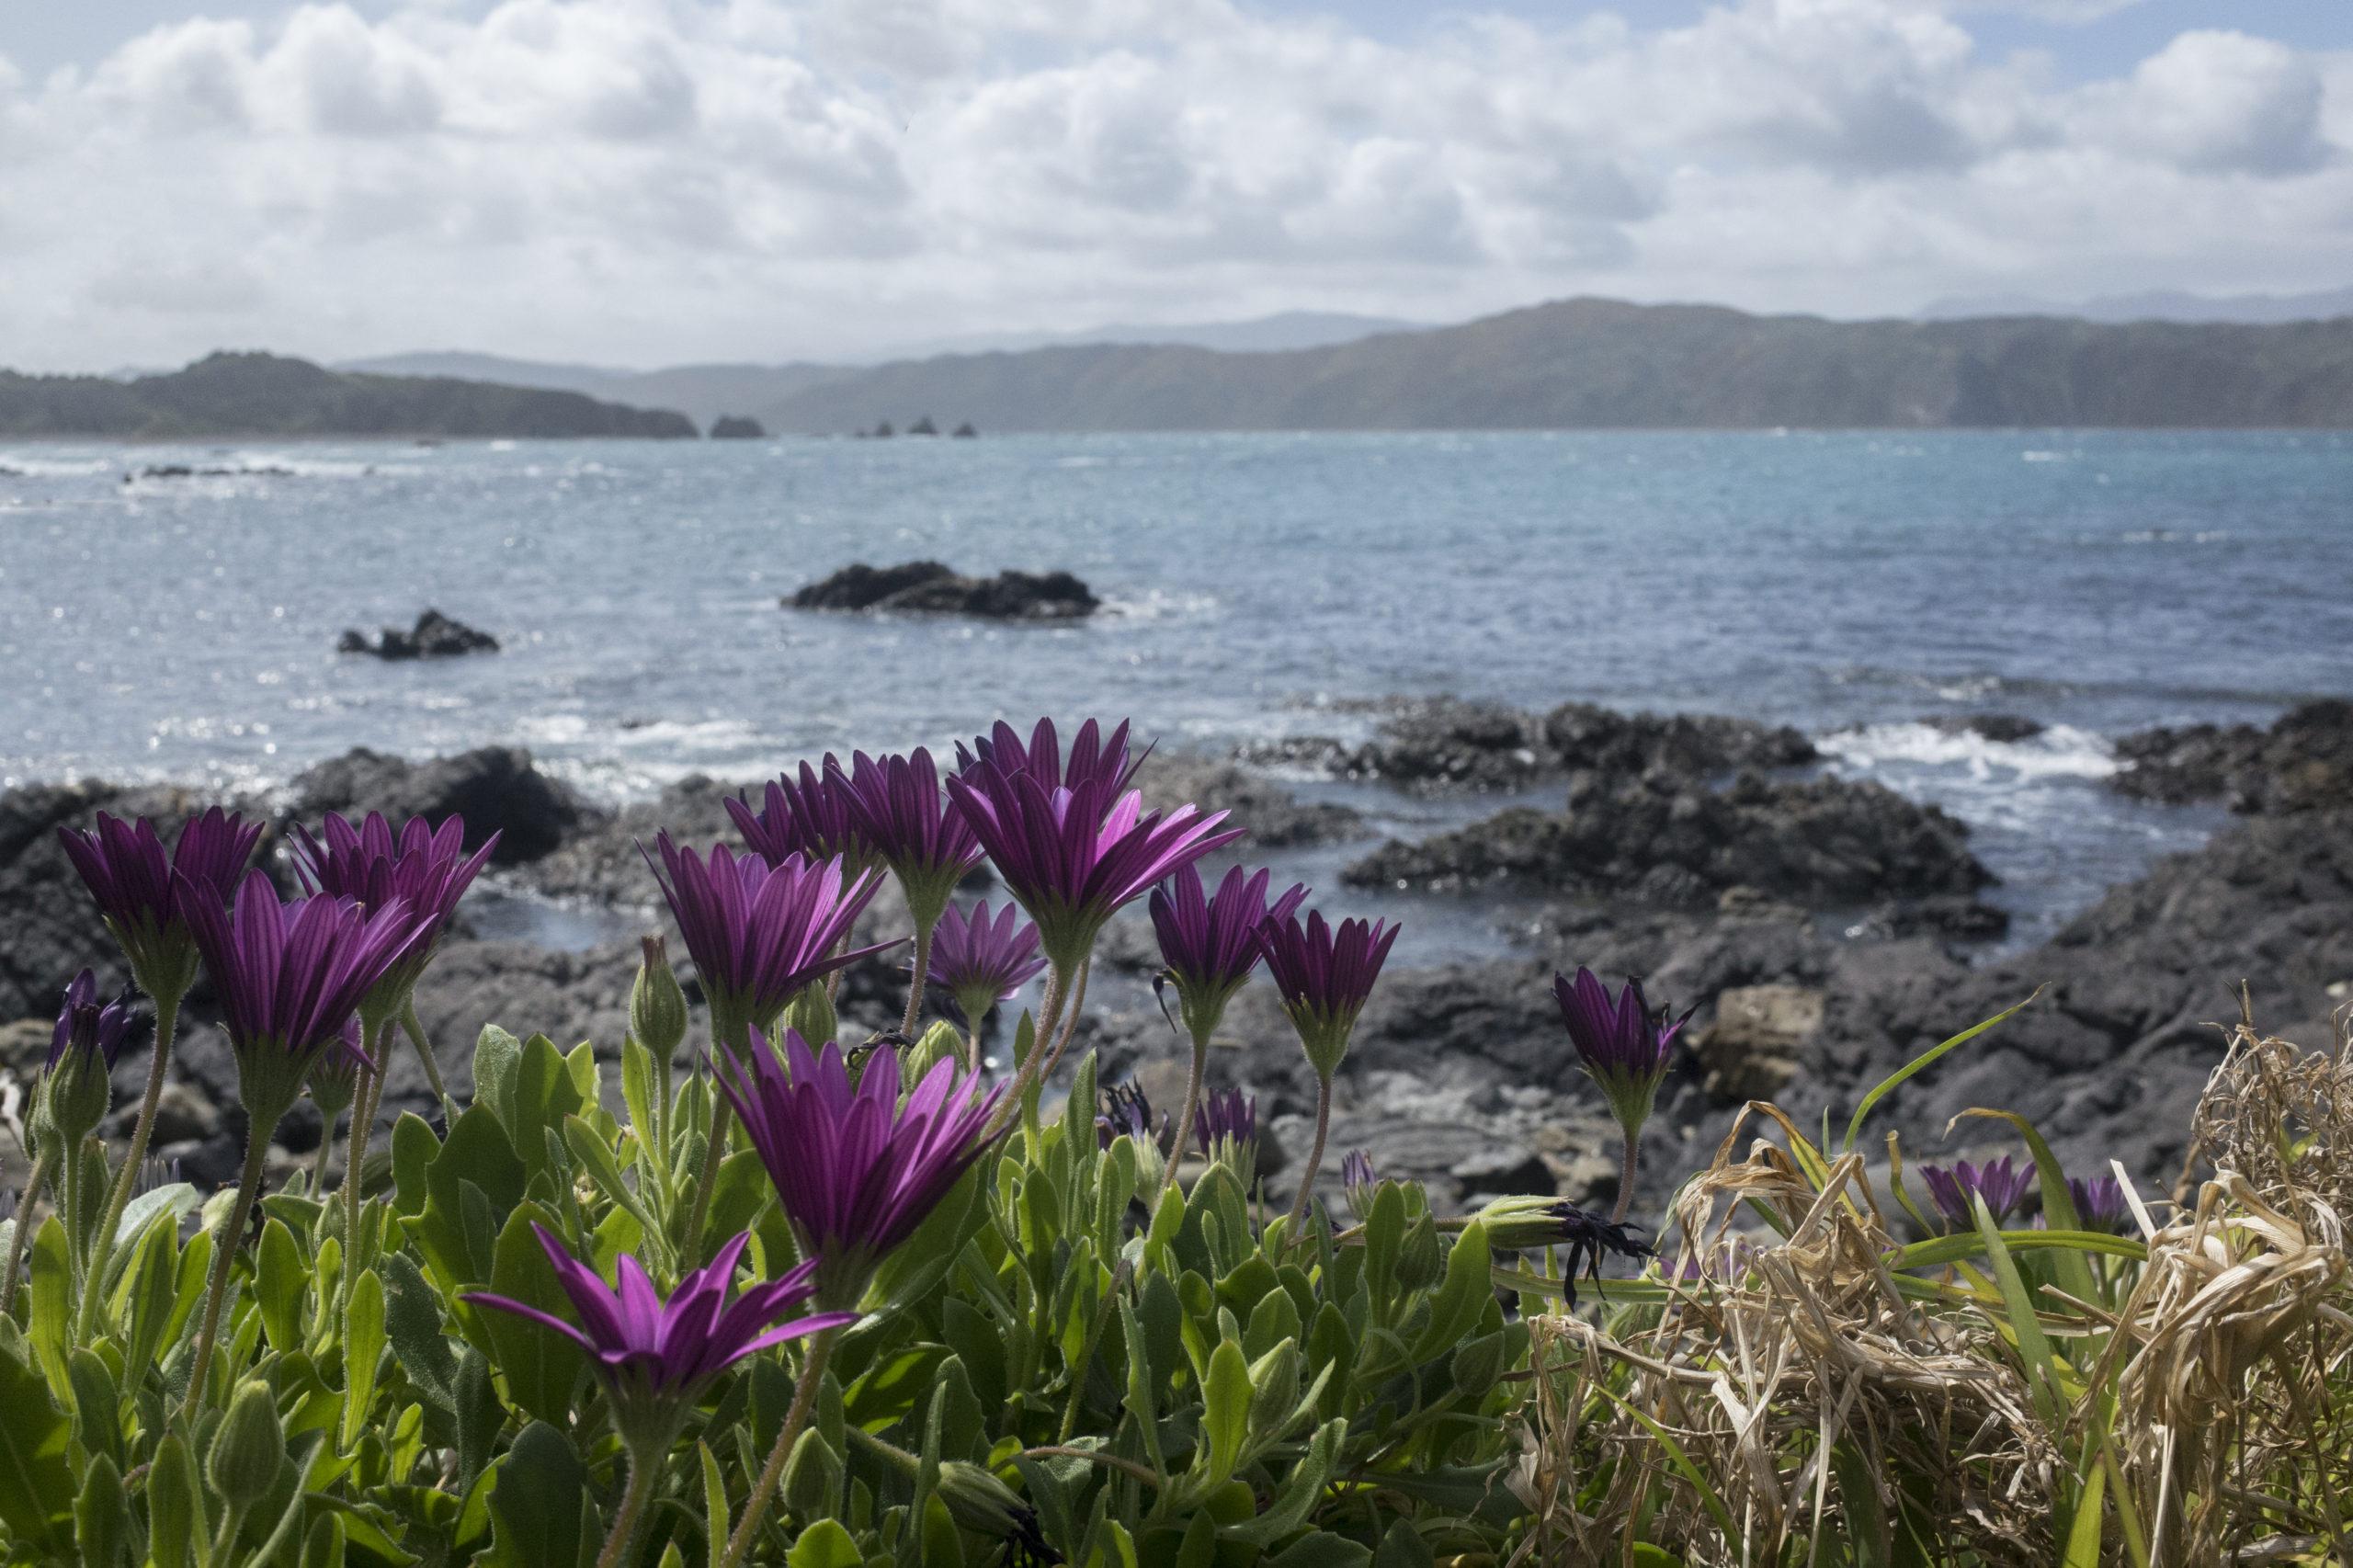 Photograph of Breaker Bay, New Zealand